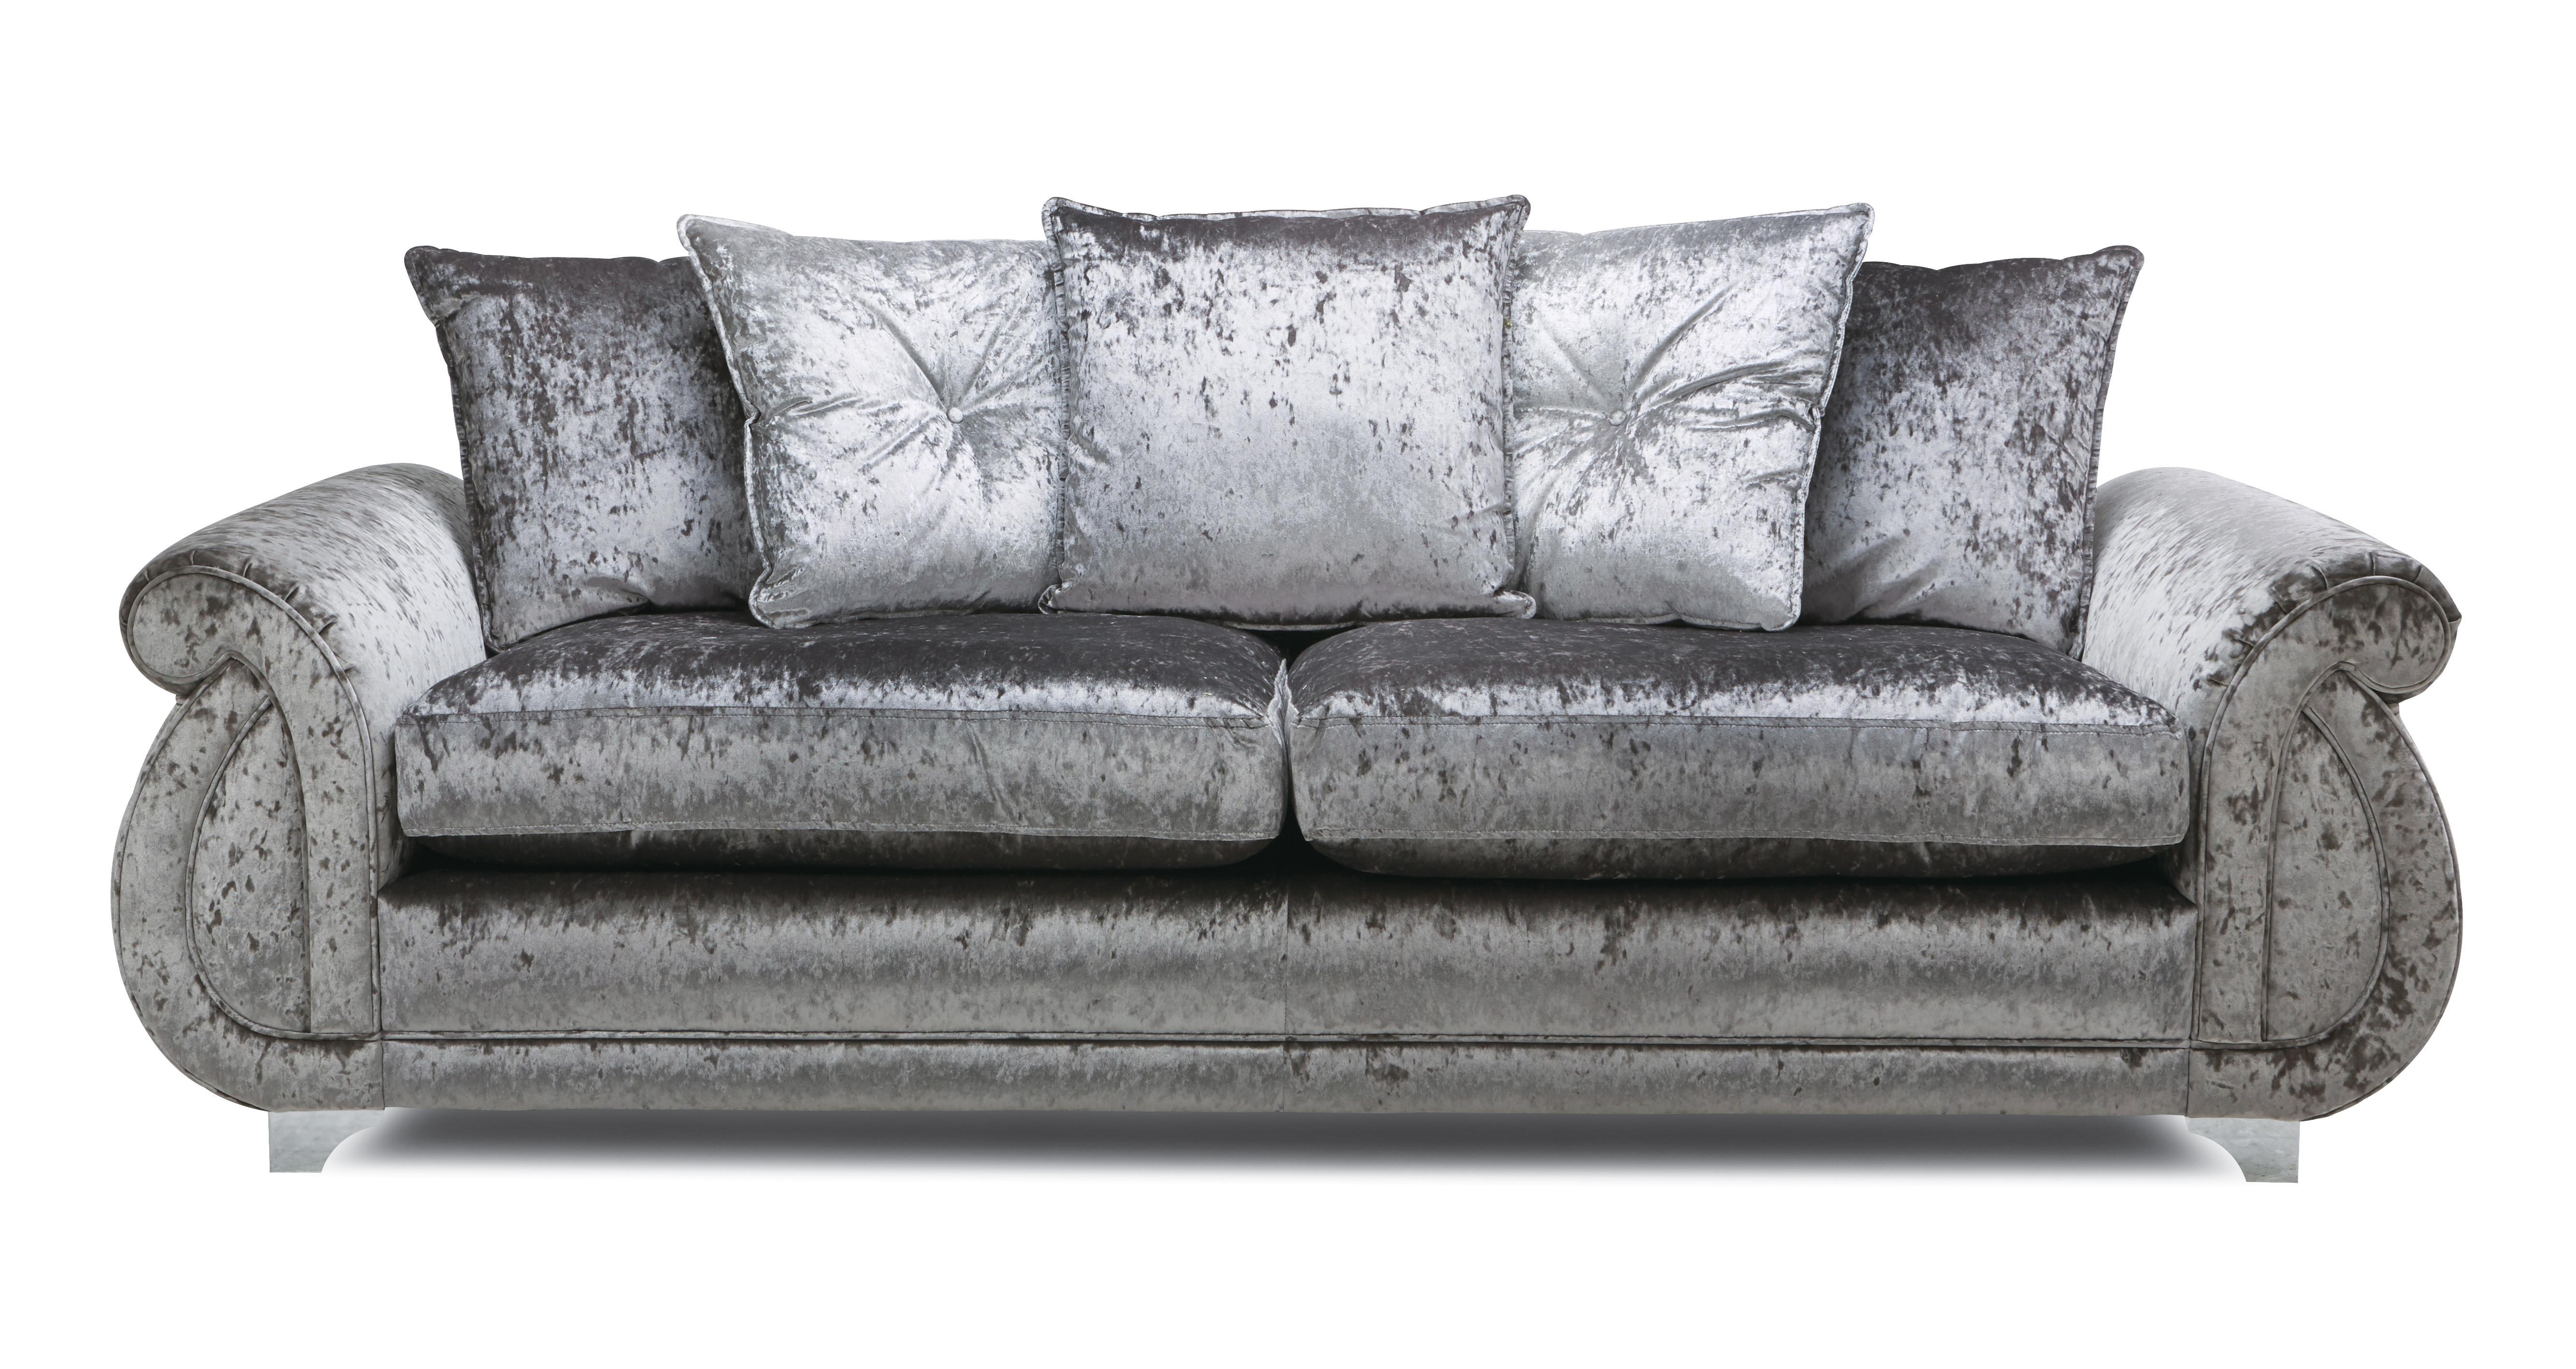 hot sale online 23dca 3de01 Gabriella: Pillow Back 4 Seater Sofa